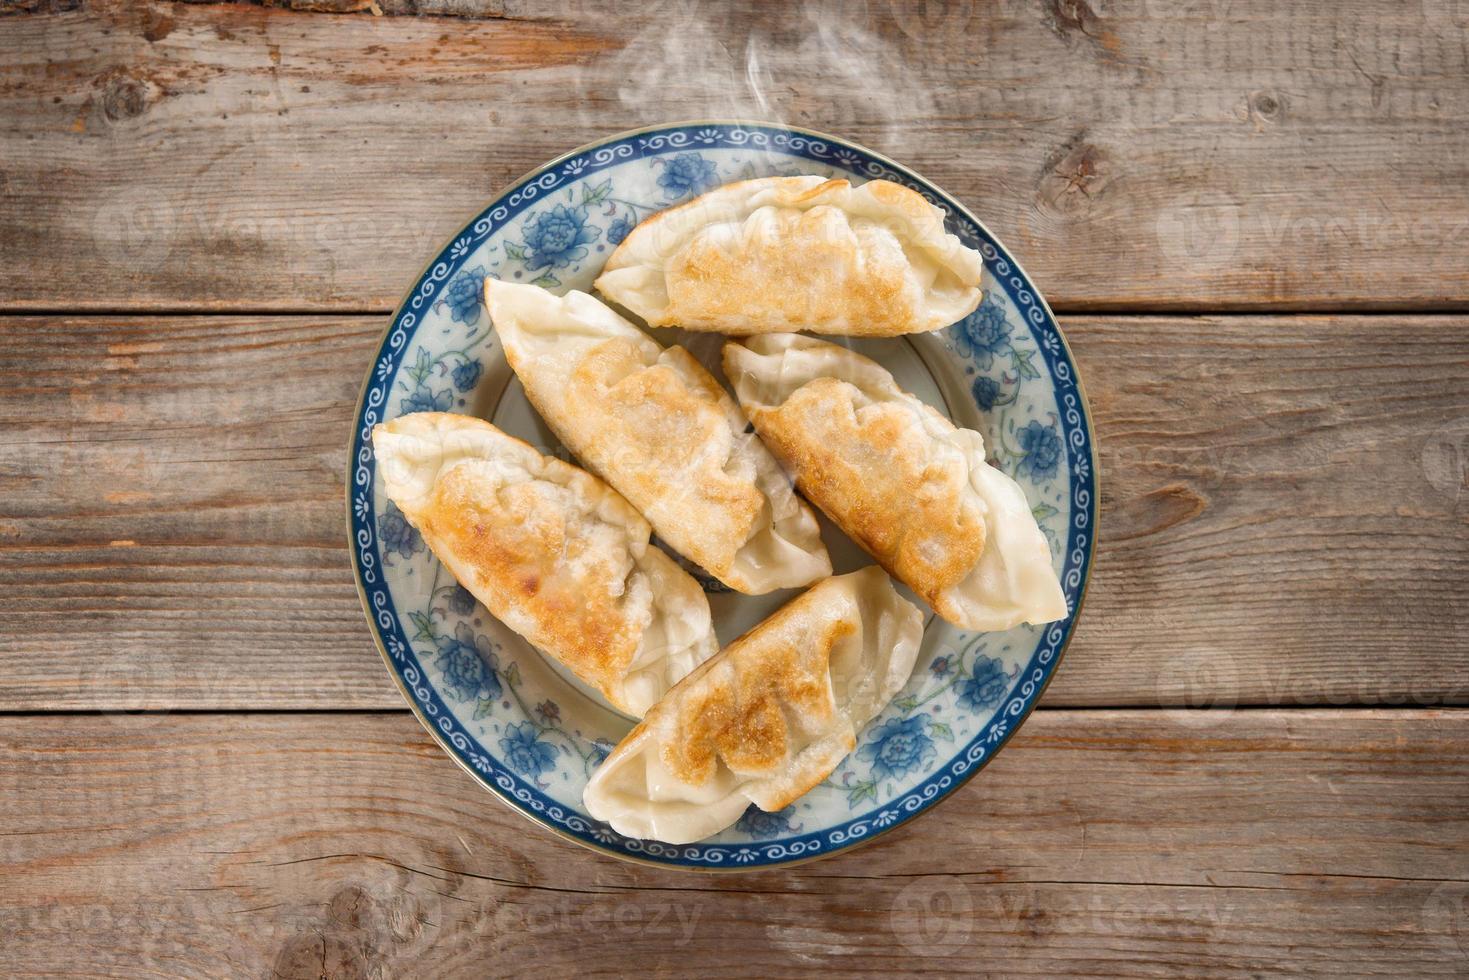 asiatiska aptitretare stekt dumplings foto